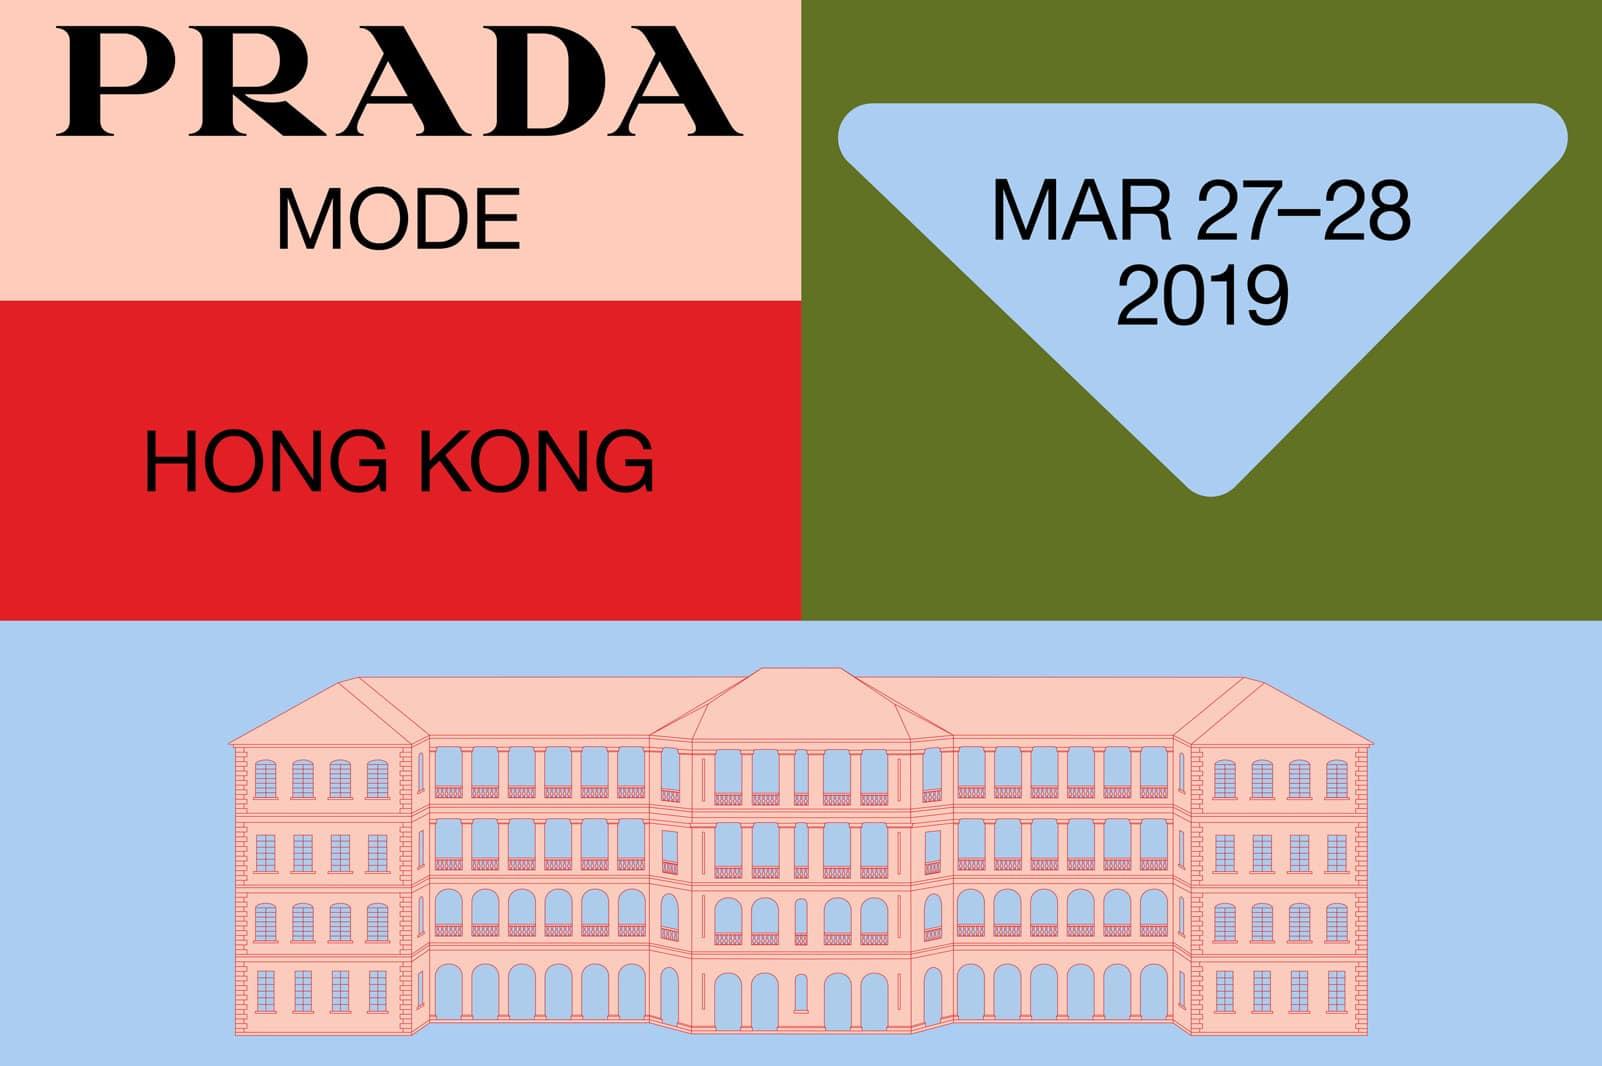 Art Basel 2019 - Prada